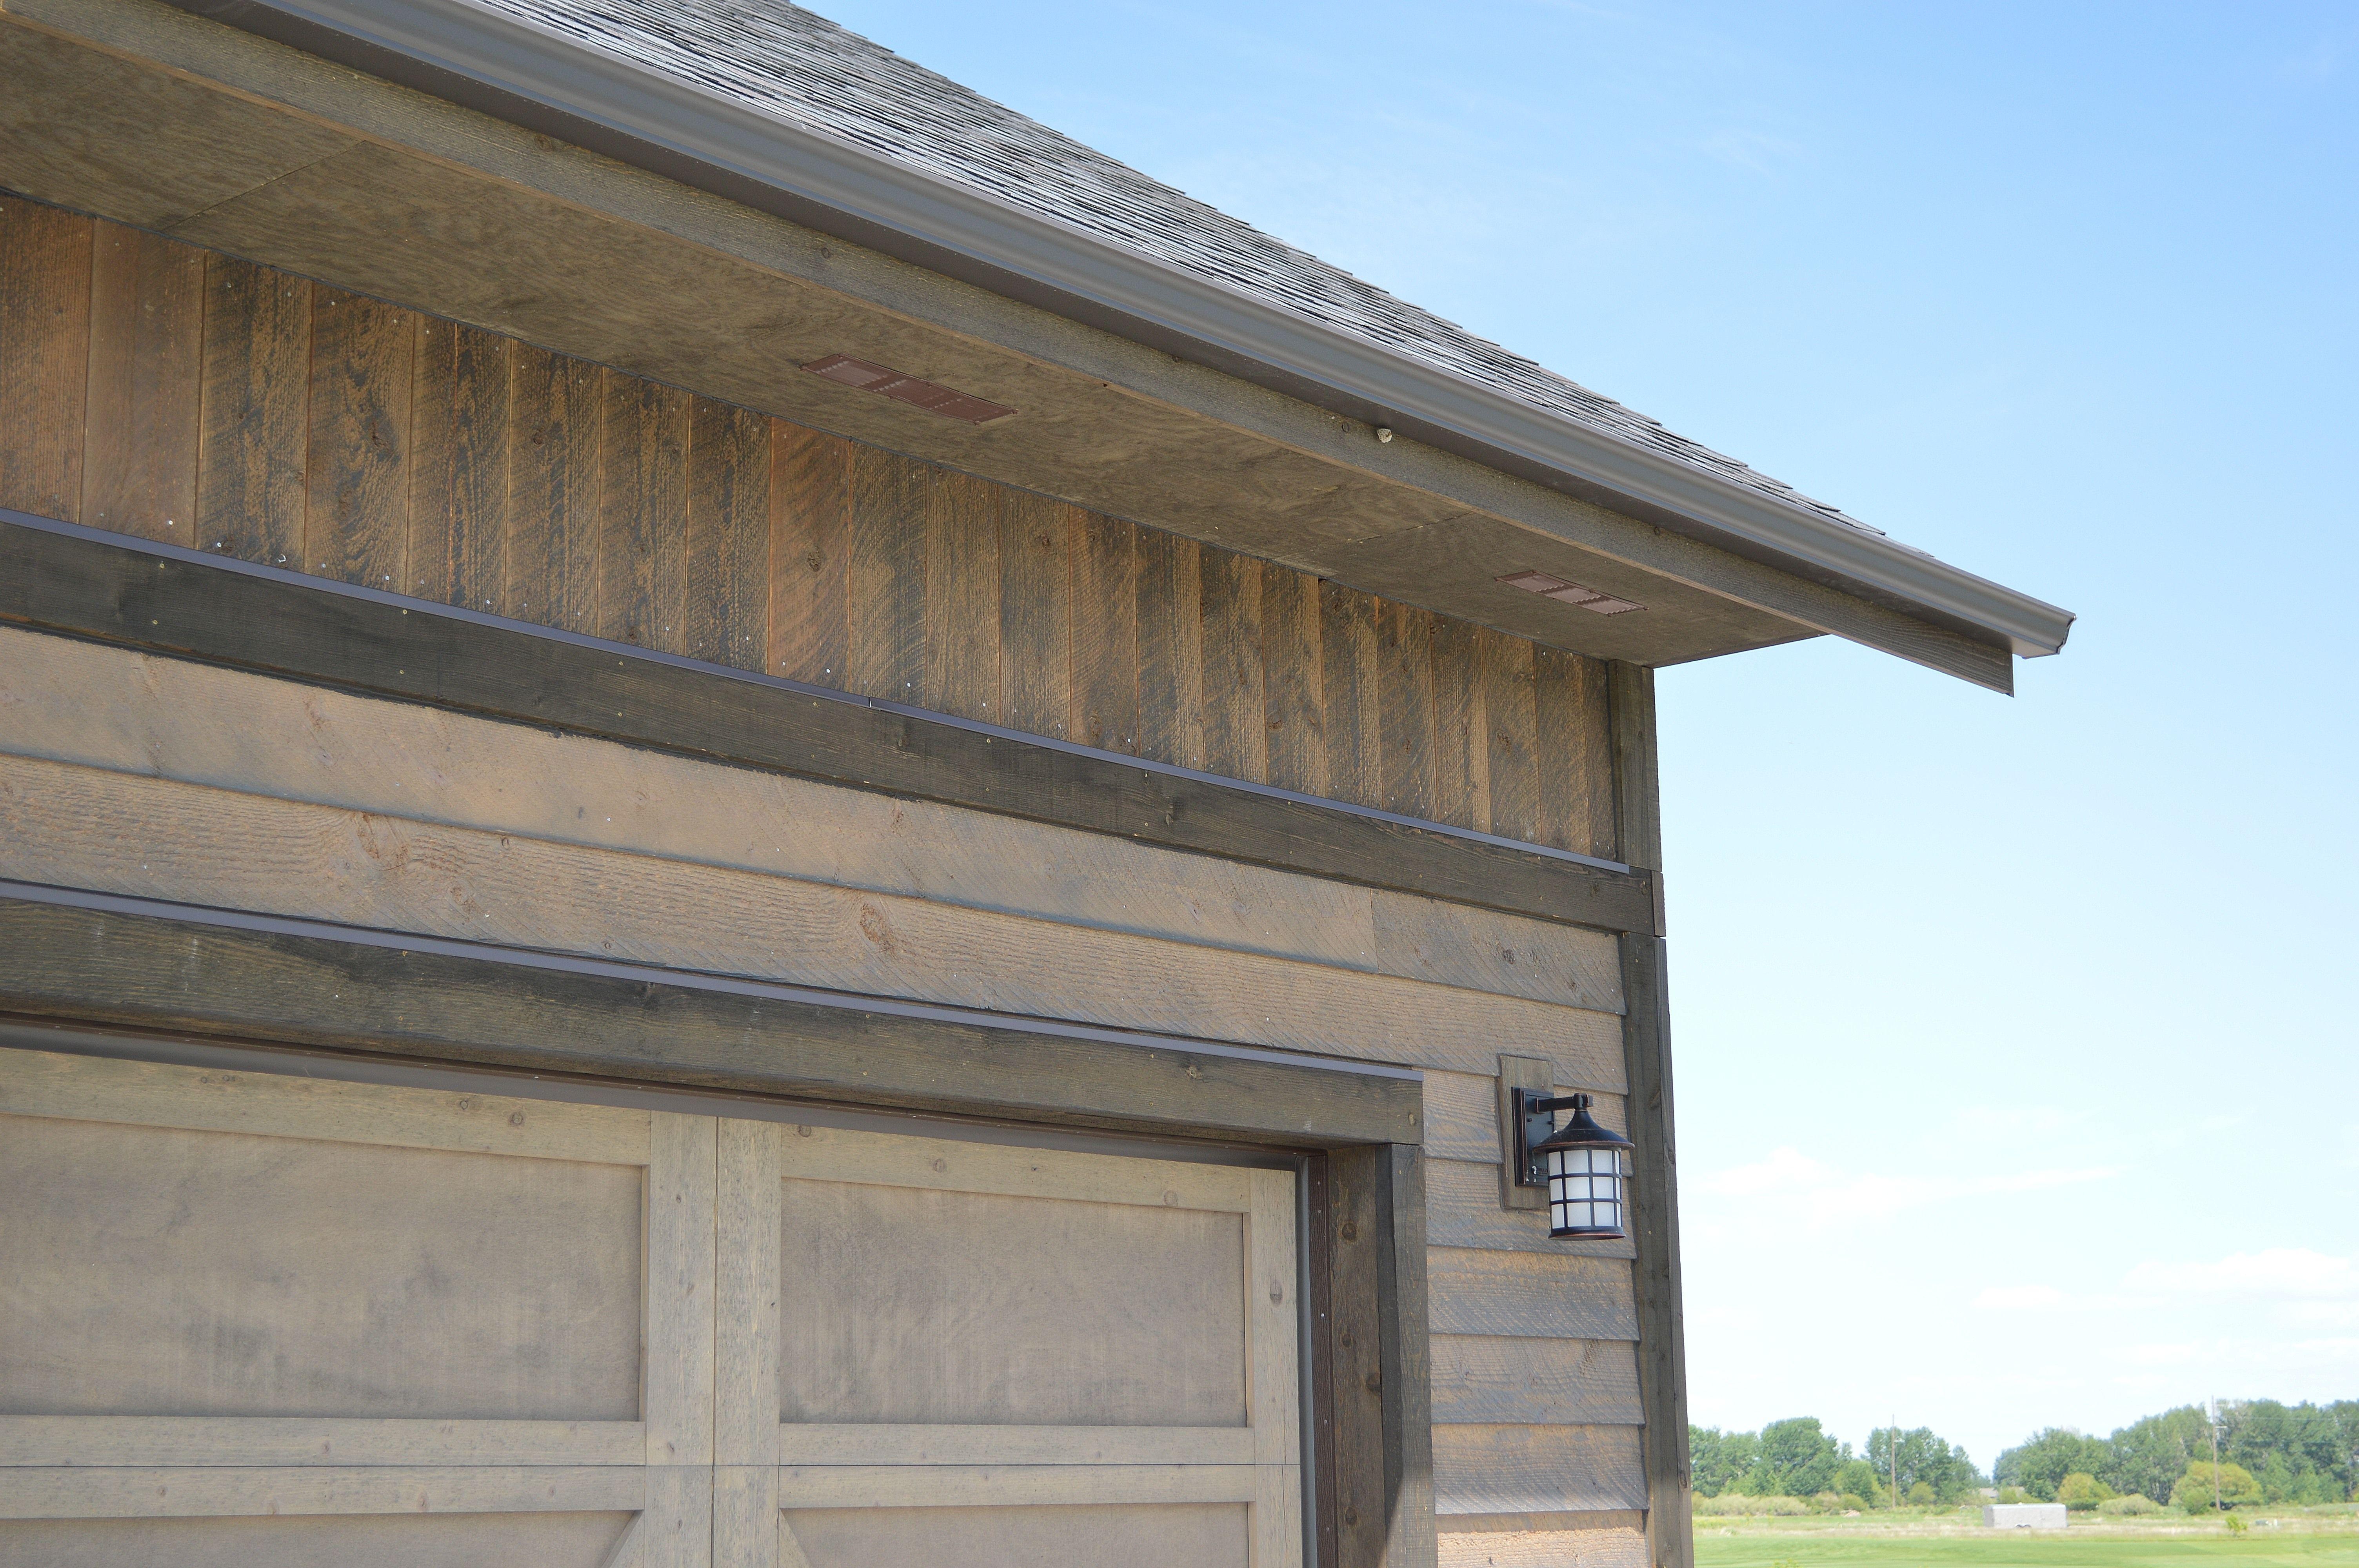 Rustic Reclaimed Barnwood Siding Ranchwood Vertical Vinyl Siding Reclaimed Barn Wood Wood Siding